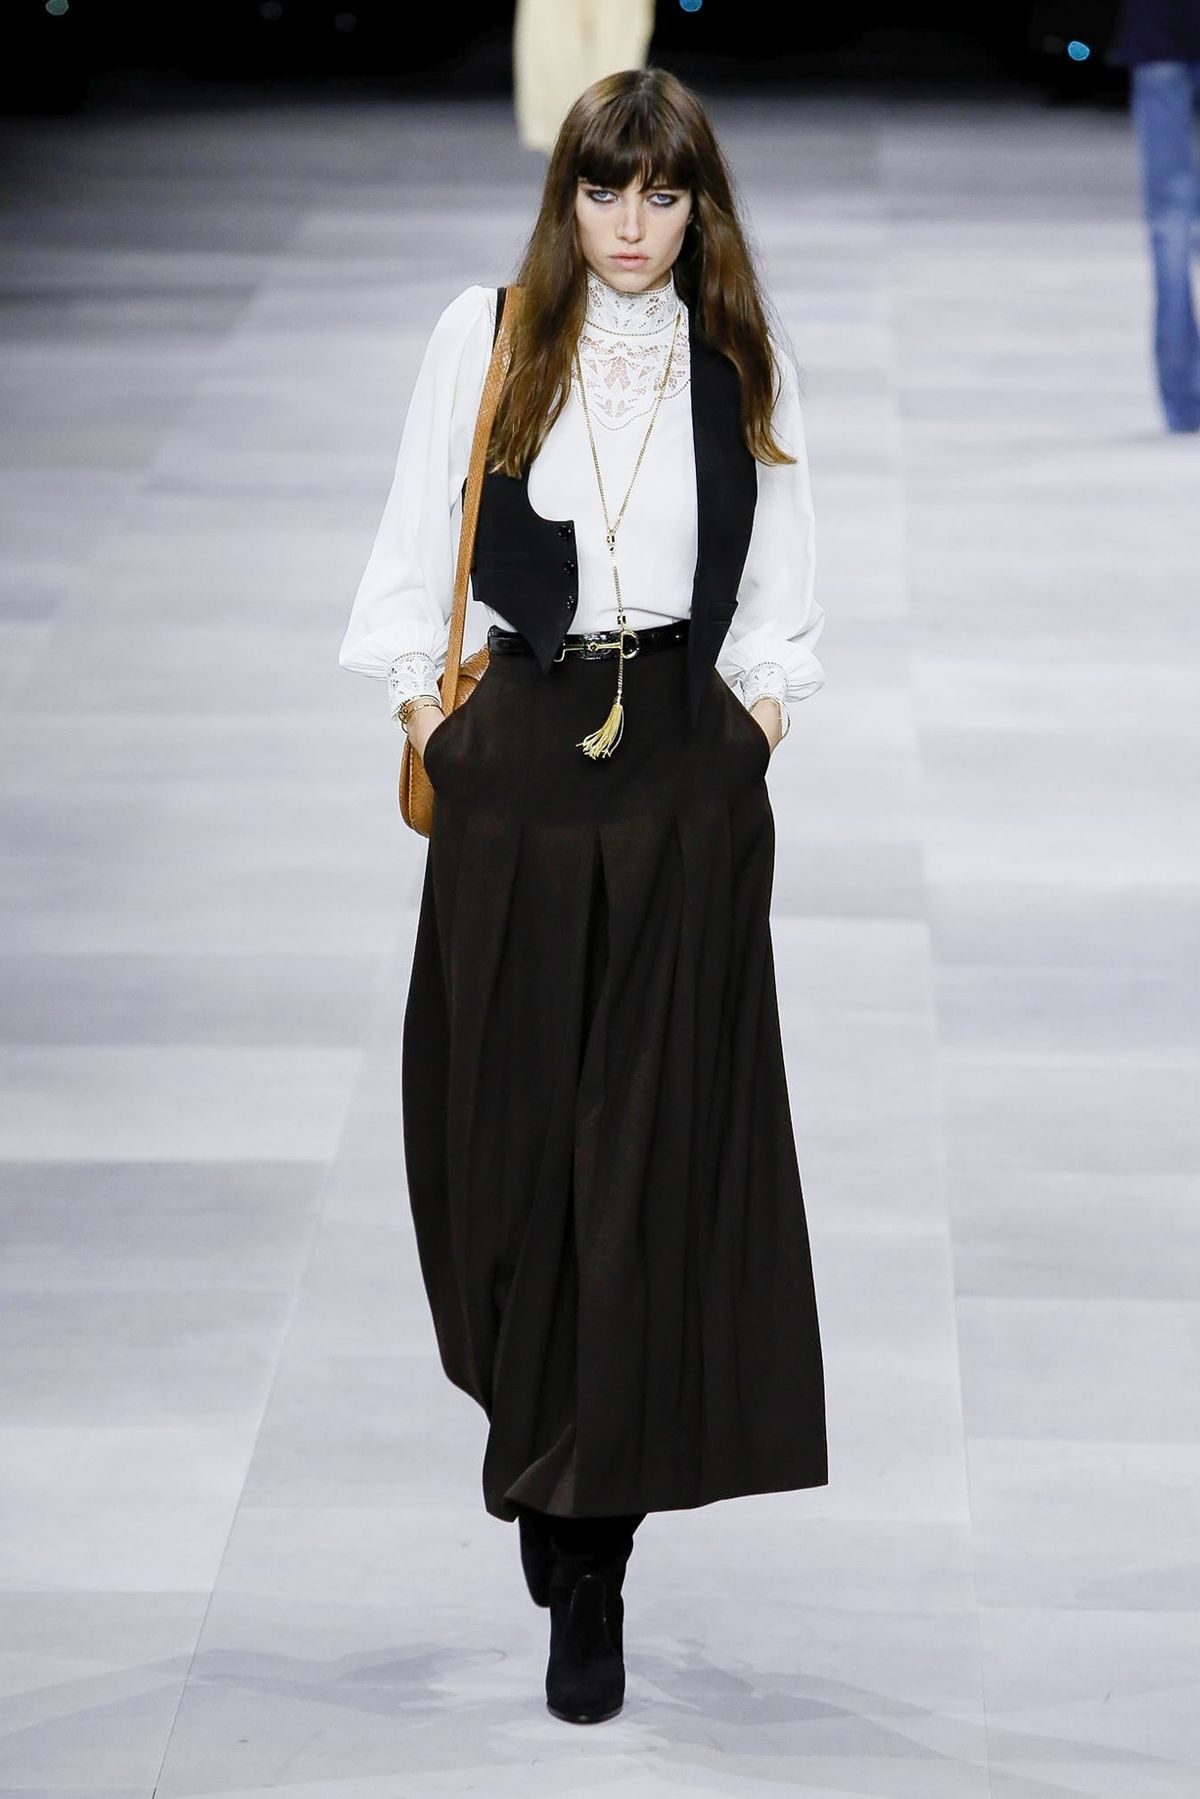 Céline Spring Summer 2020 (With images) Fashion, Celine